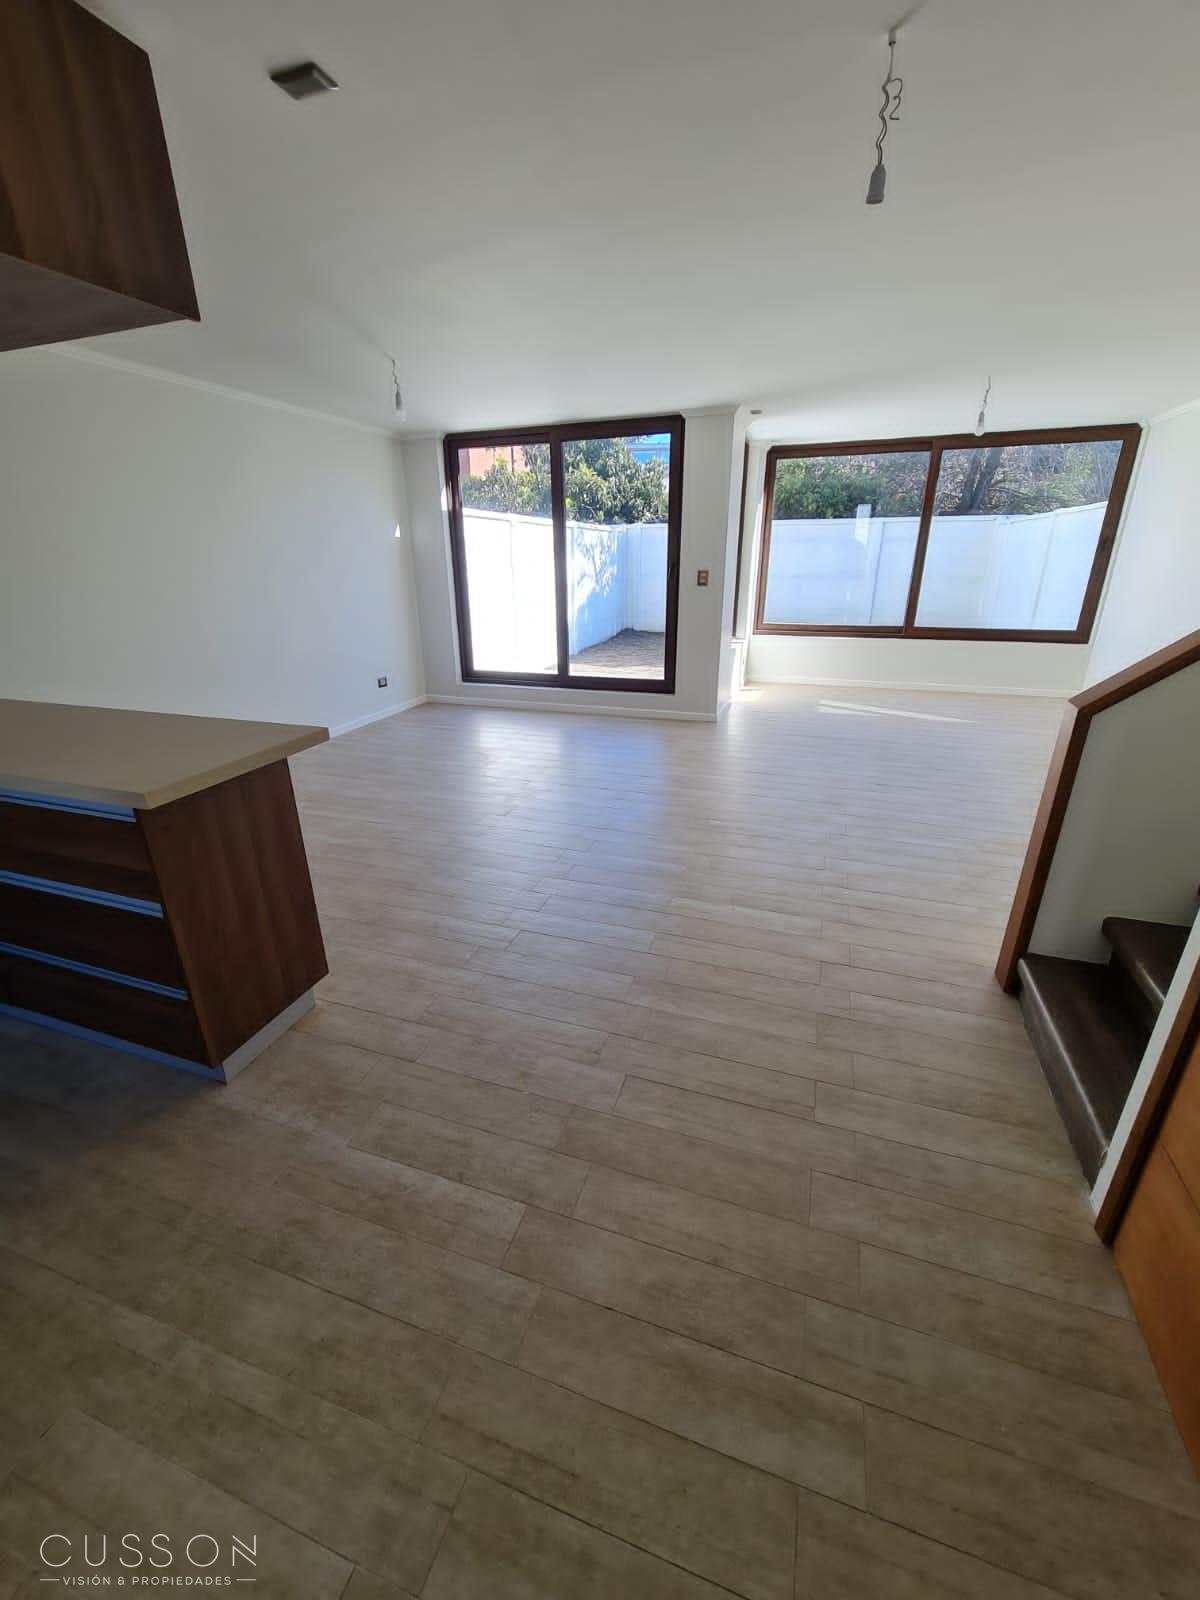 Venta Casa 105 m2 Huertos familiares